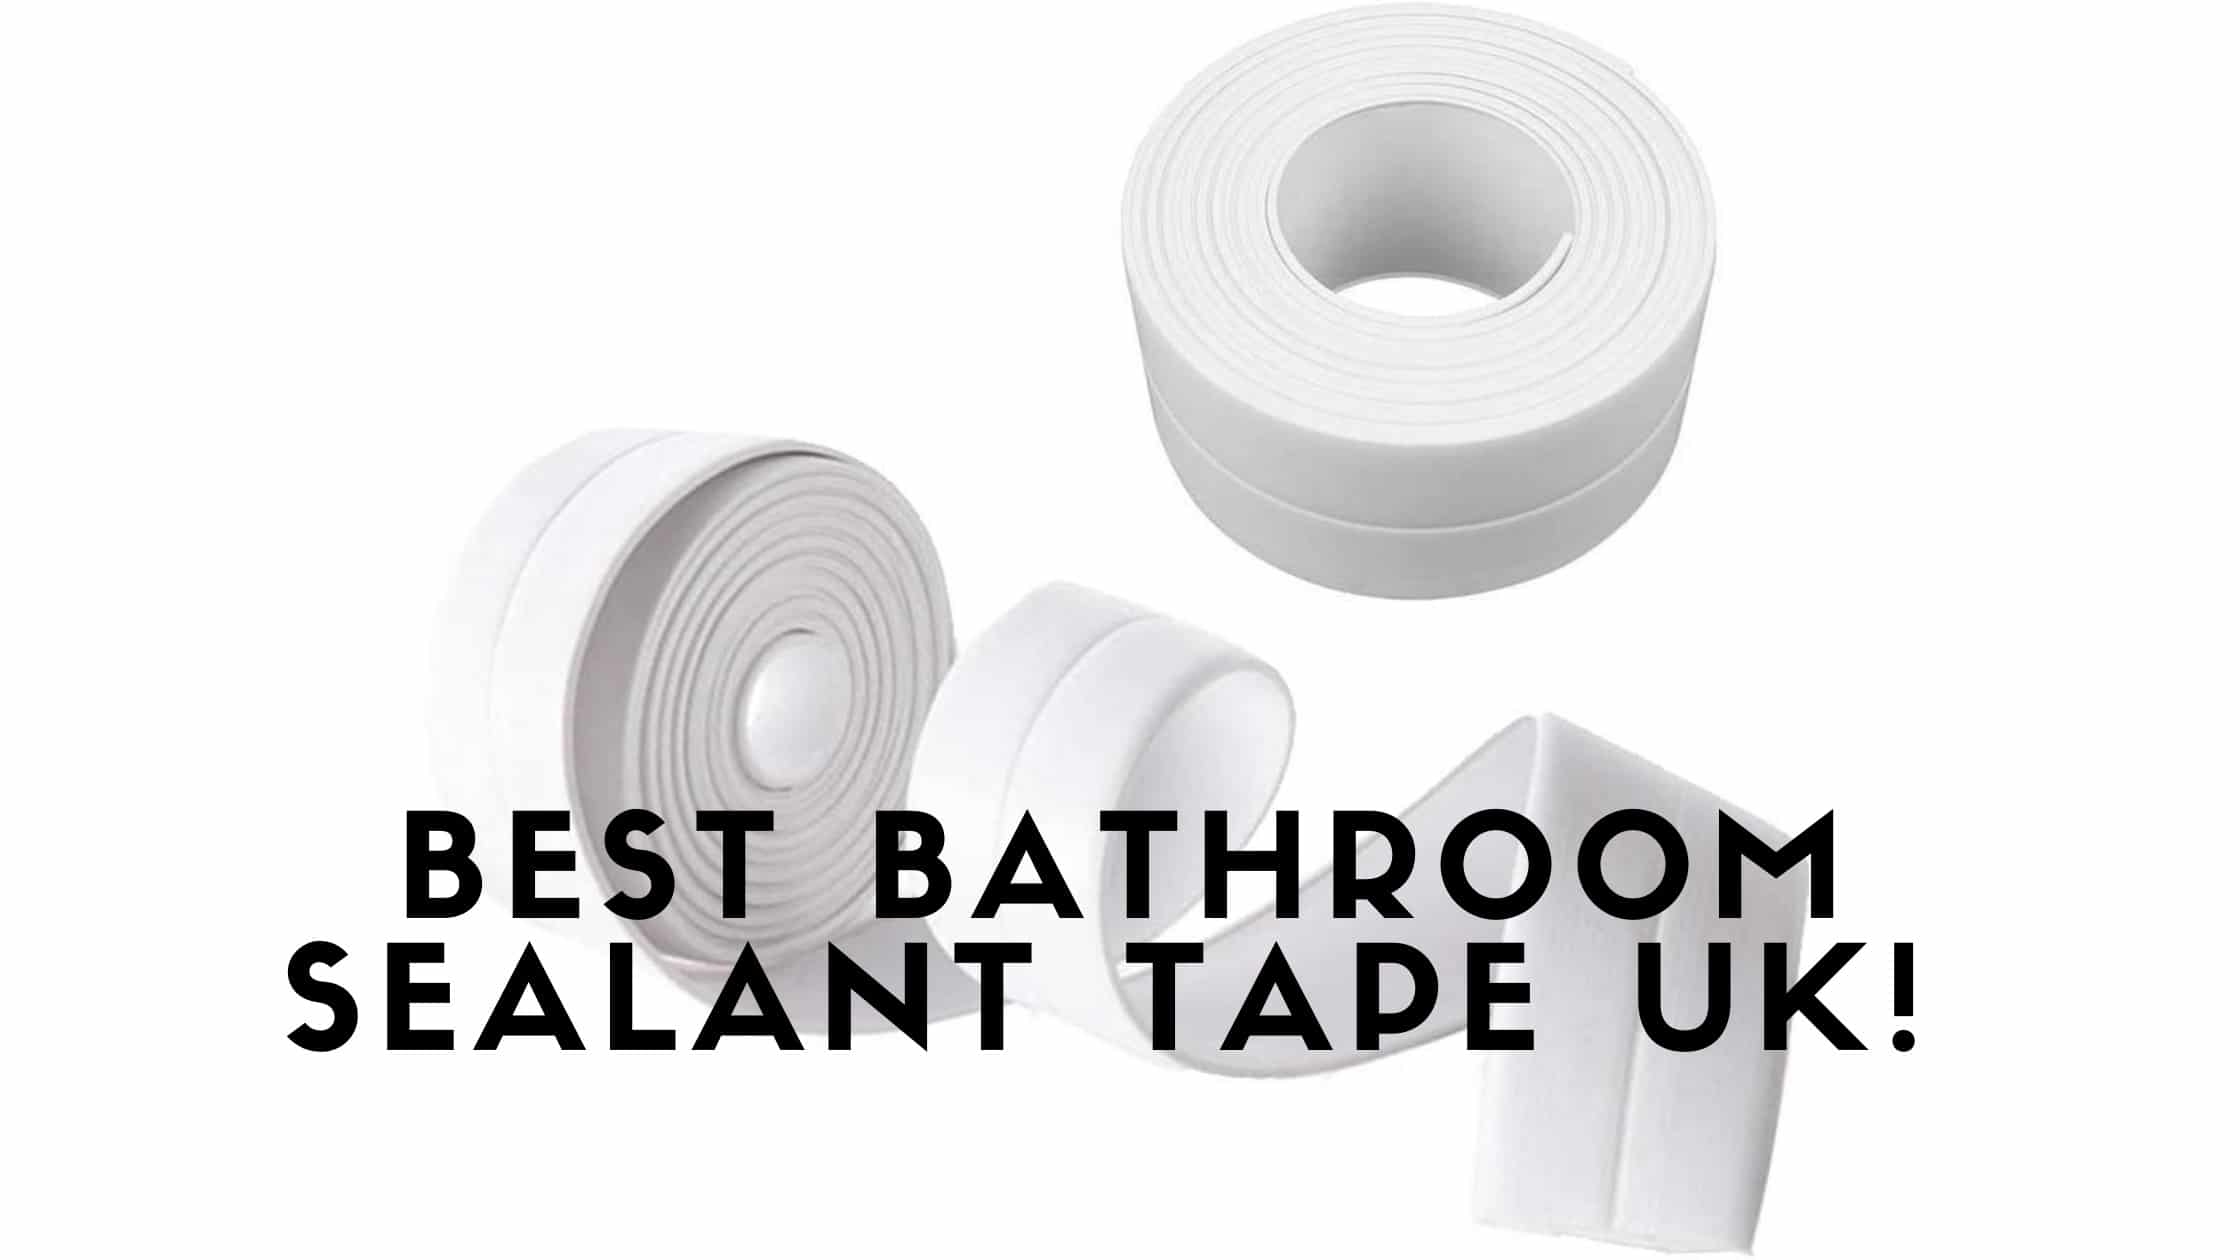 Best Bathroom Sealant Tape UK